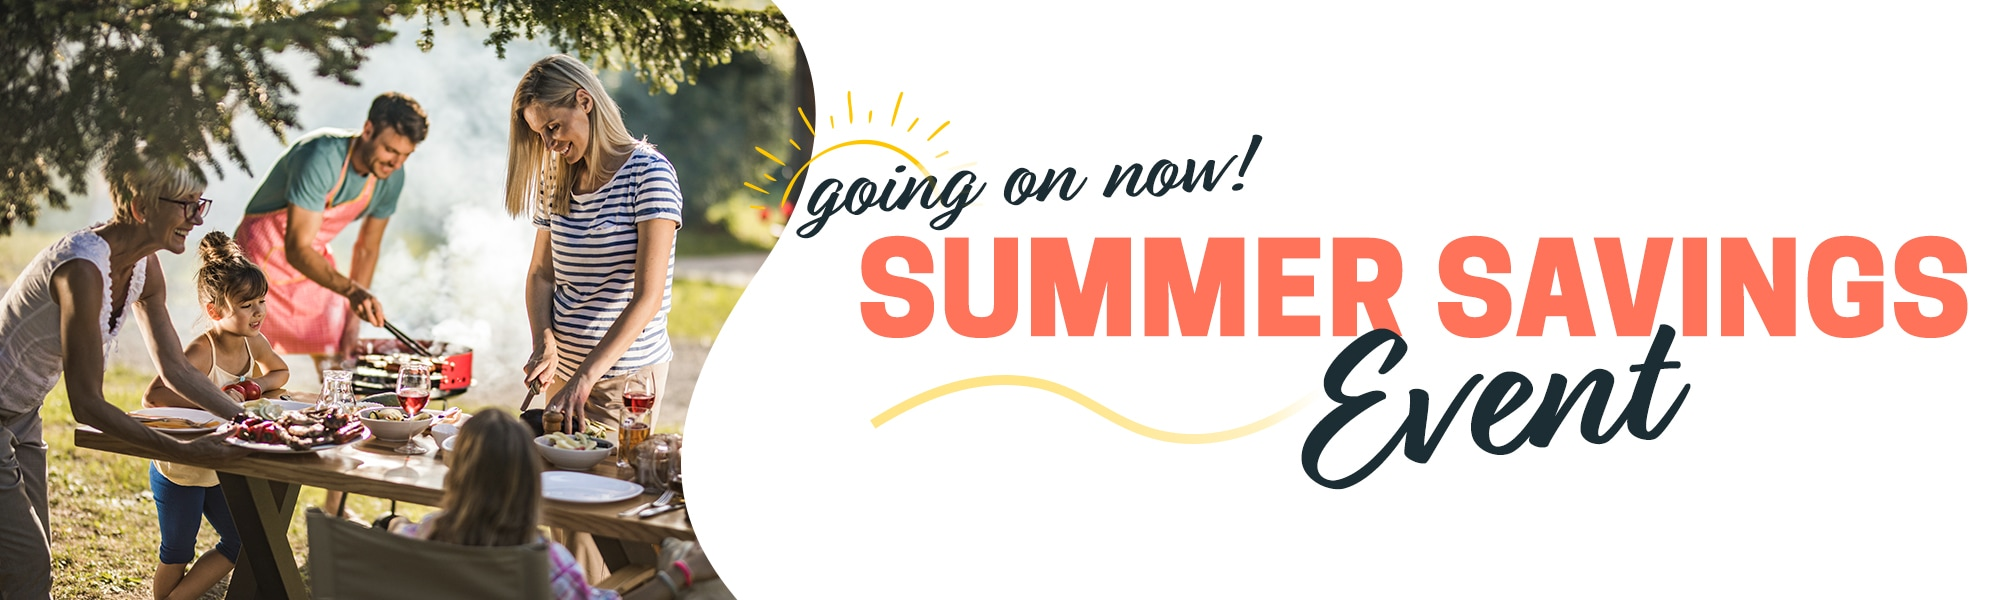 Summer Savings | Carmona's Appliance Center